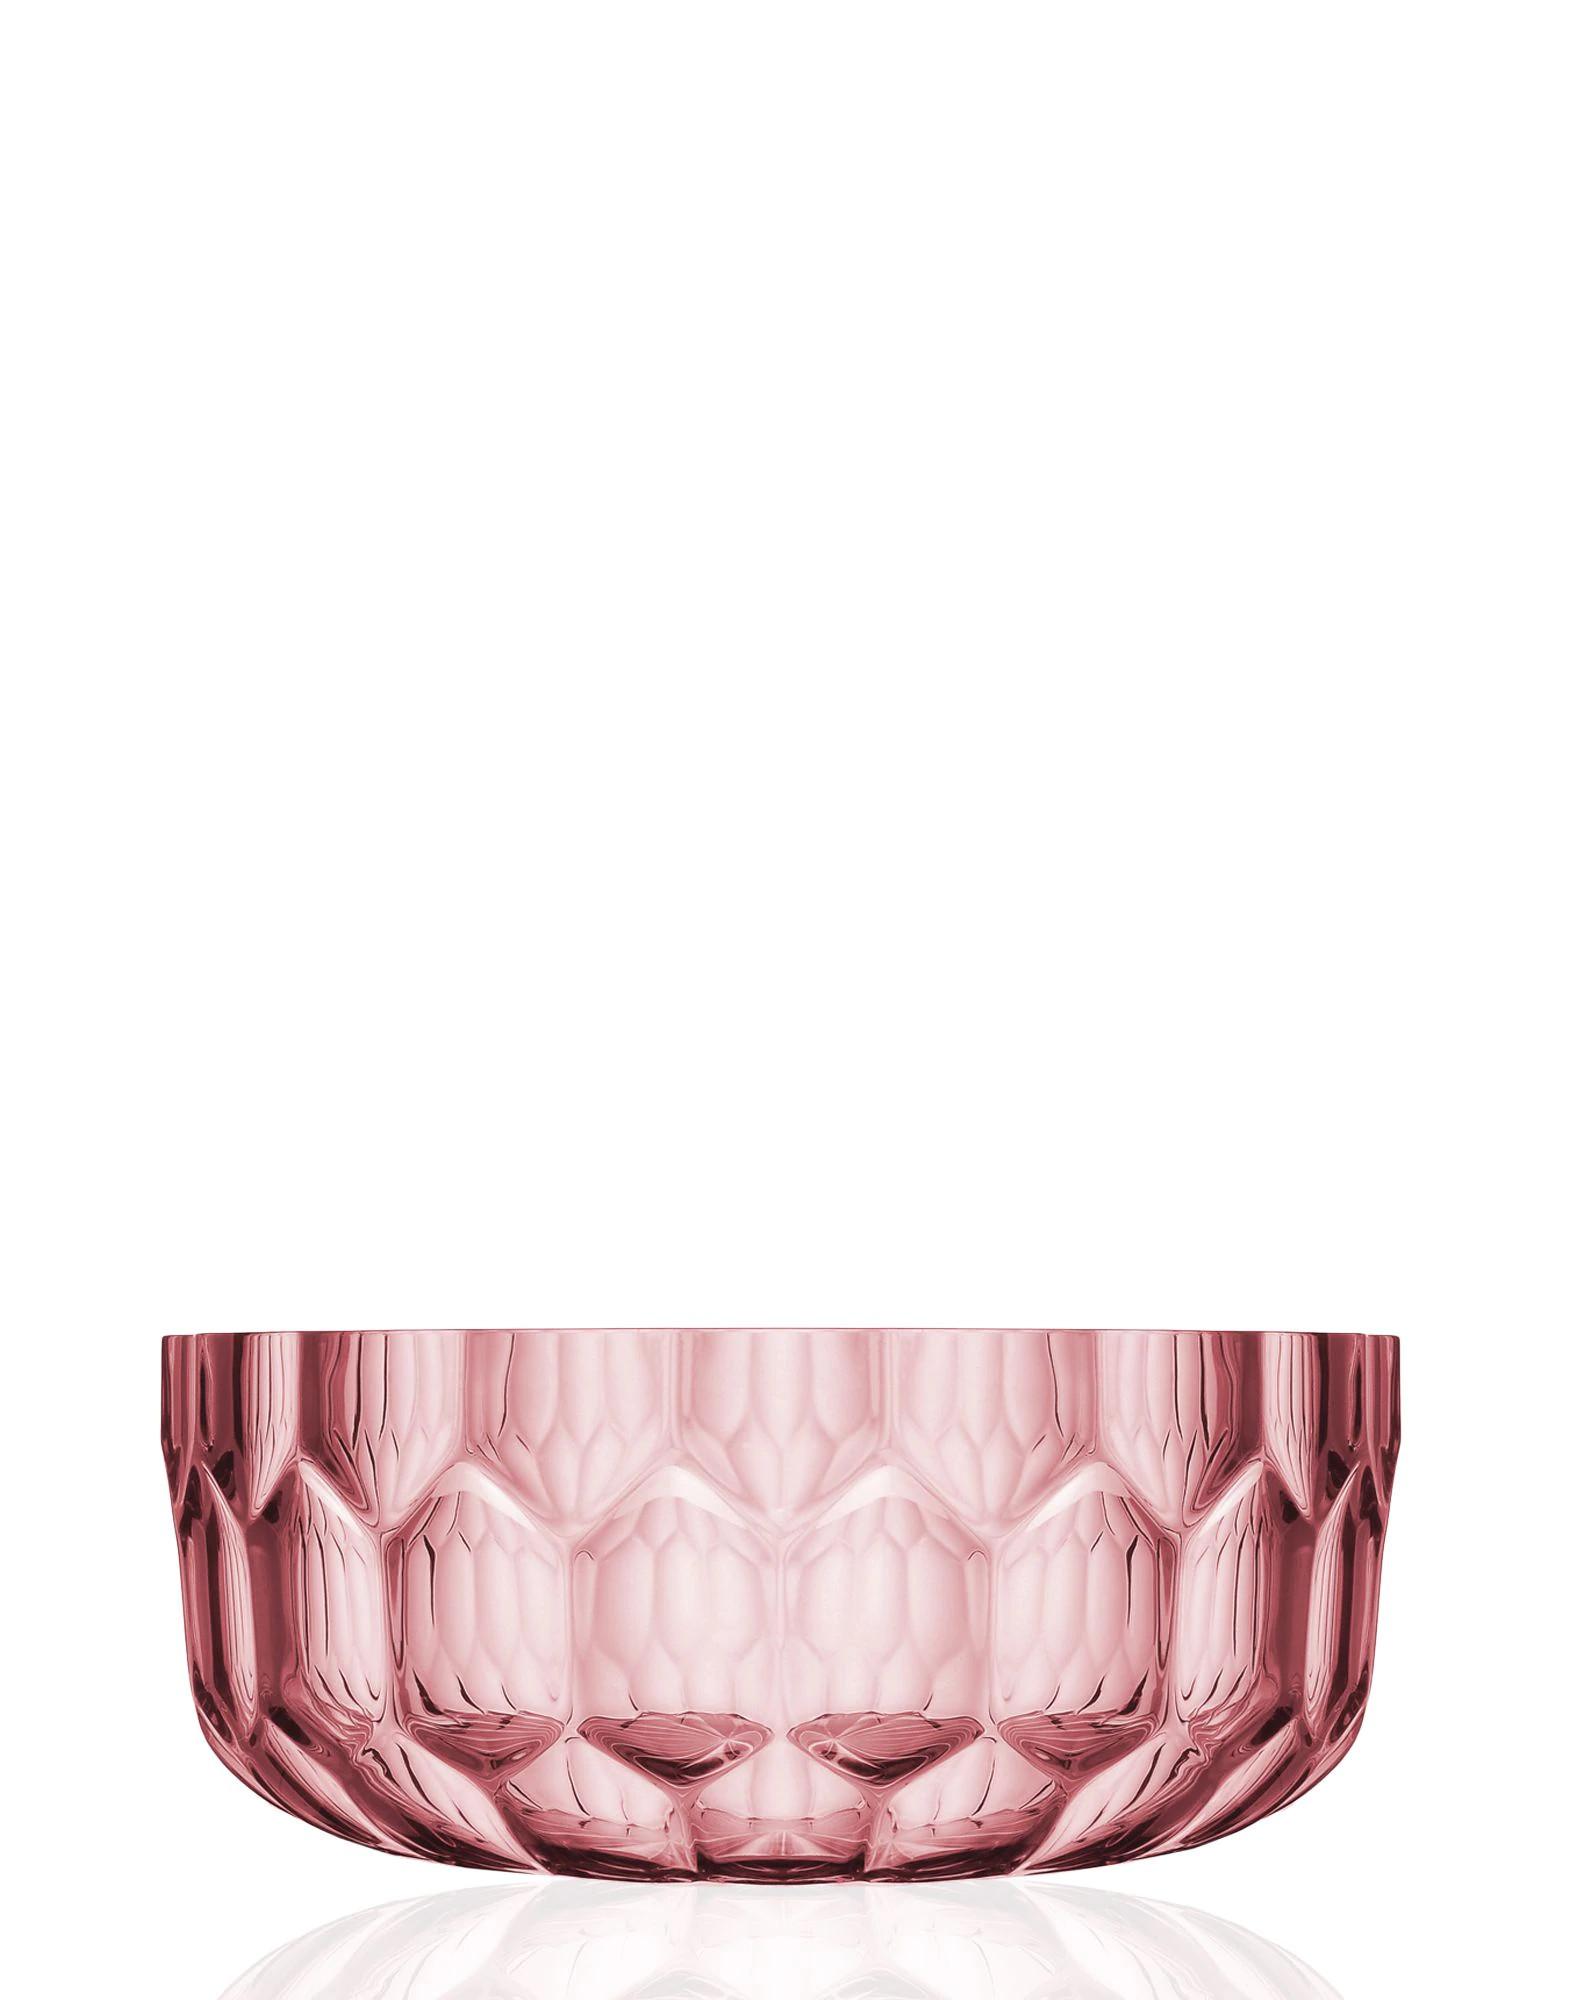 Kartell Jellies Family Salad Bowl Pink 1